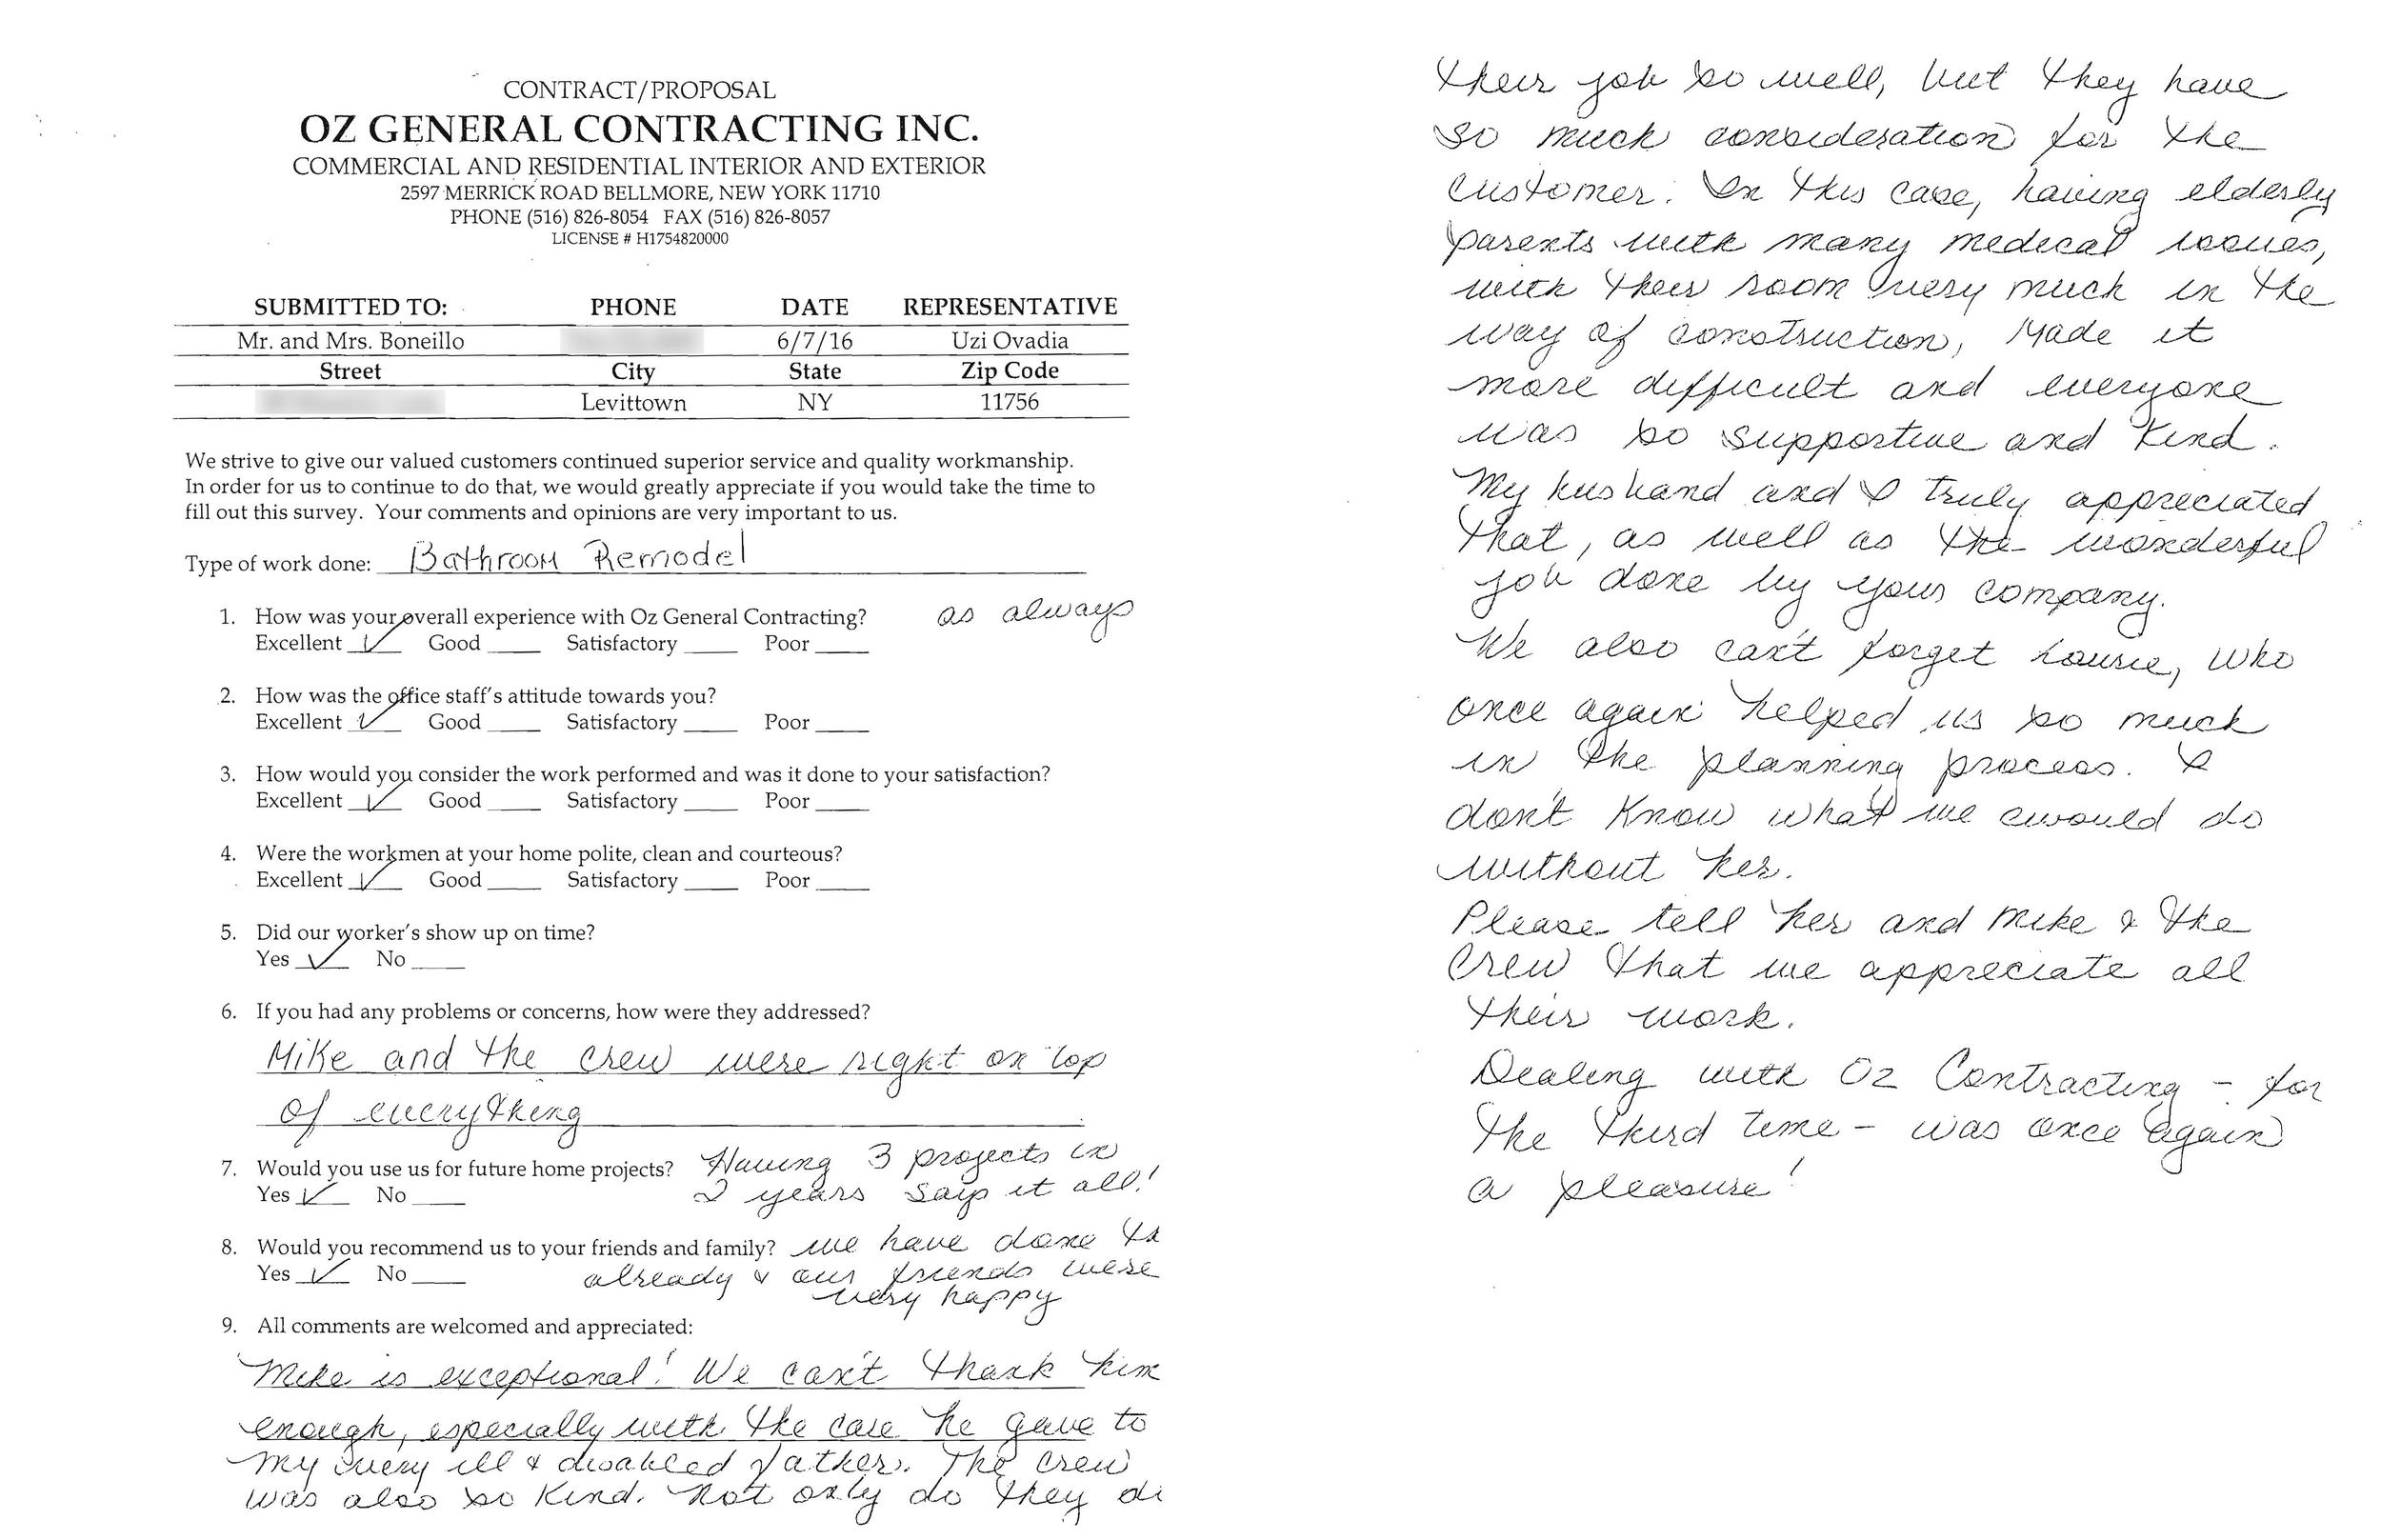 Customer Survey - Boneillo